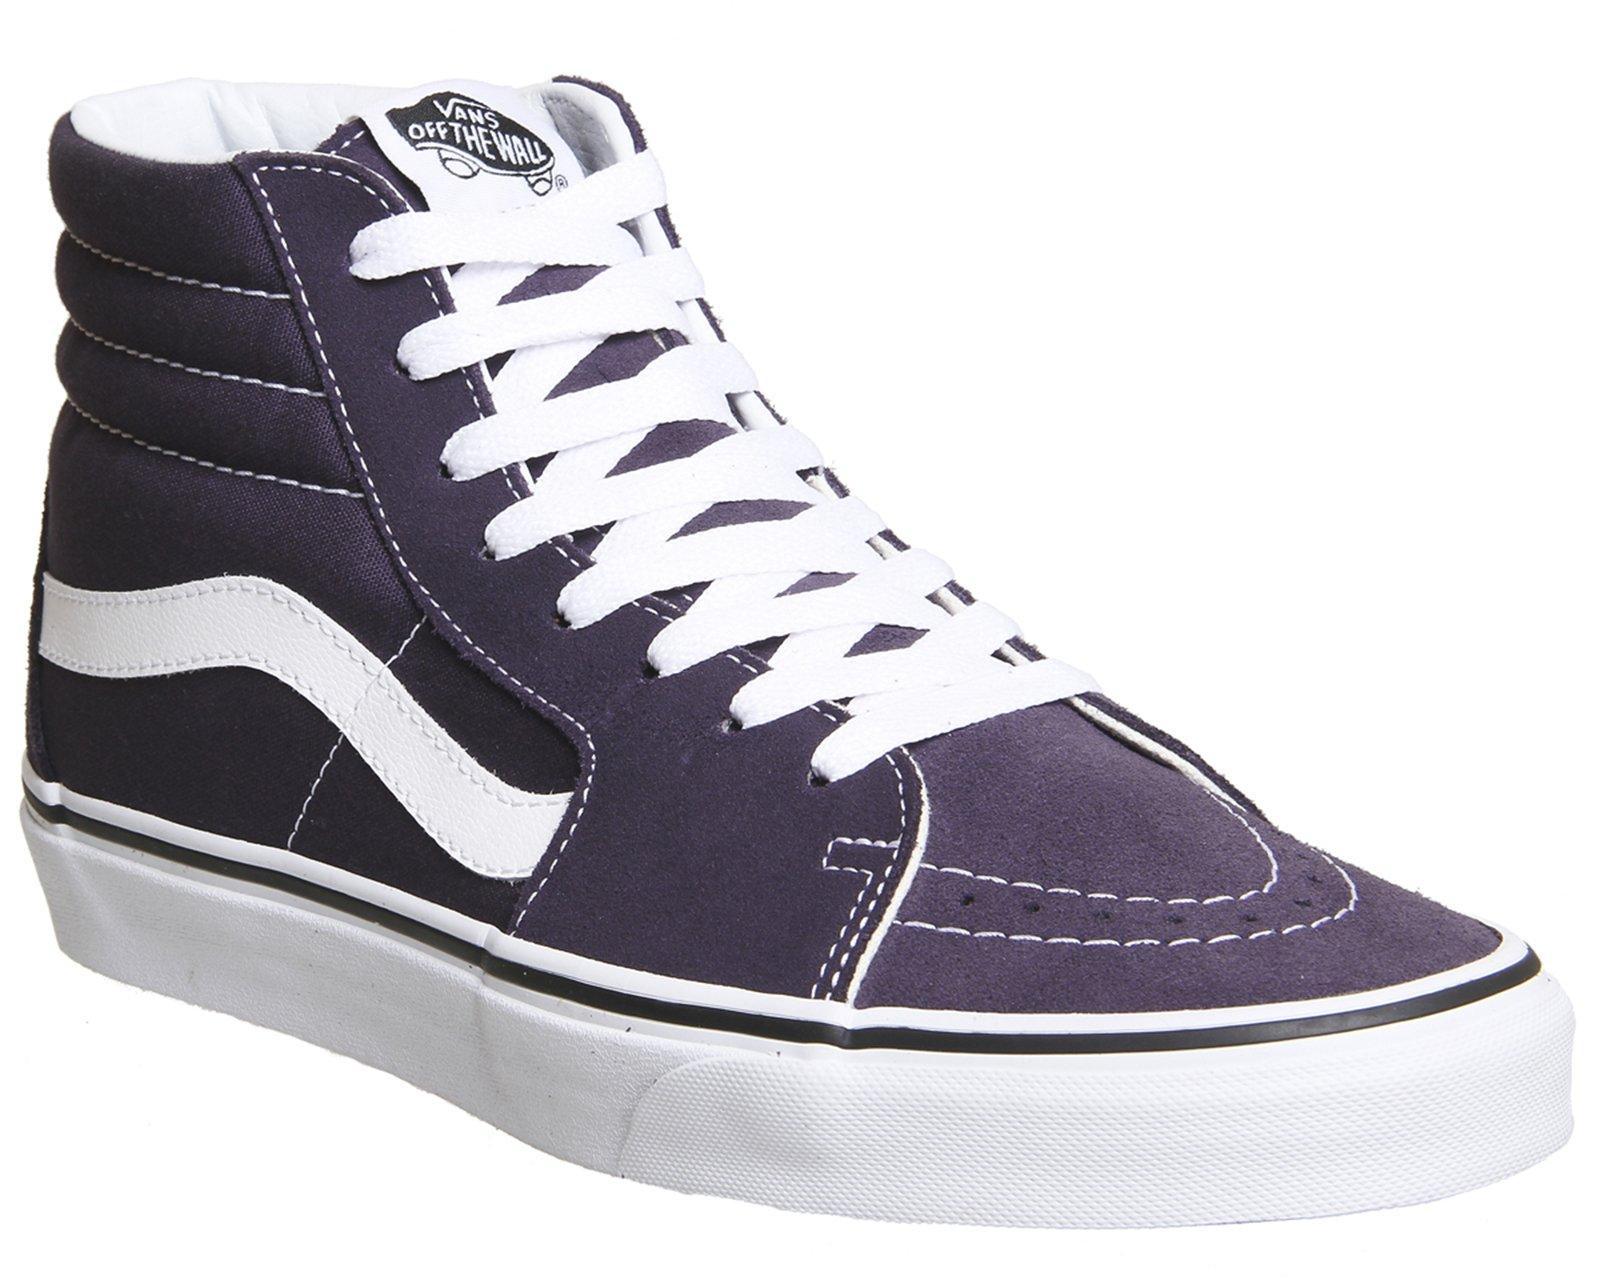 a4aab3858e4e2 Galleon - Vans Sk8 Hi Shoes 8.5 B(M) US Women/7 D(M) US Nightshade True  White